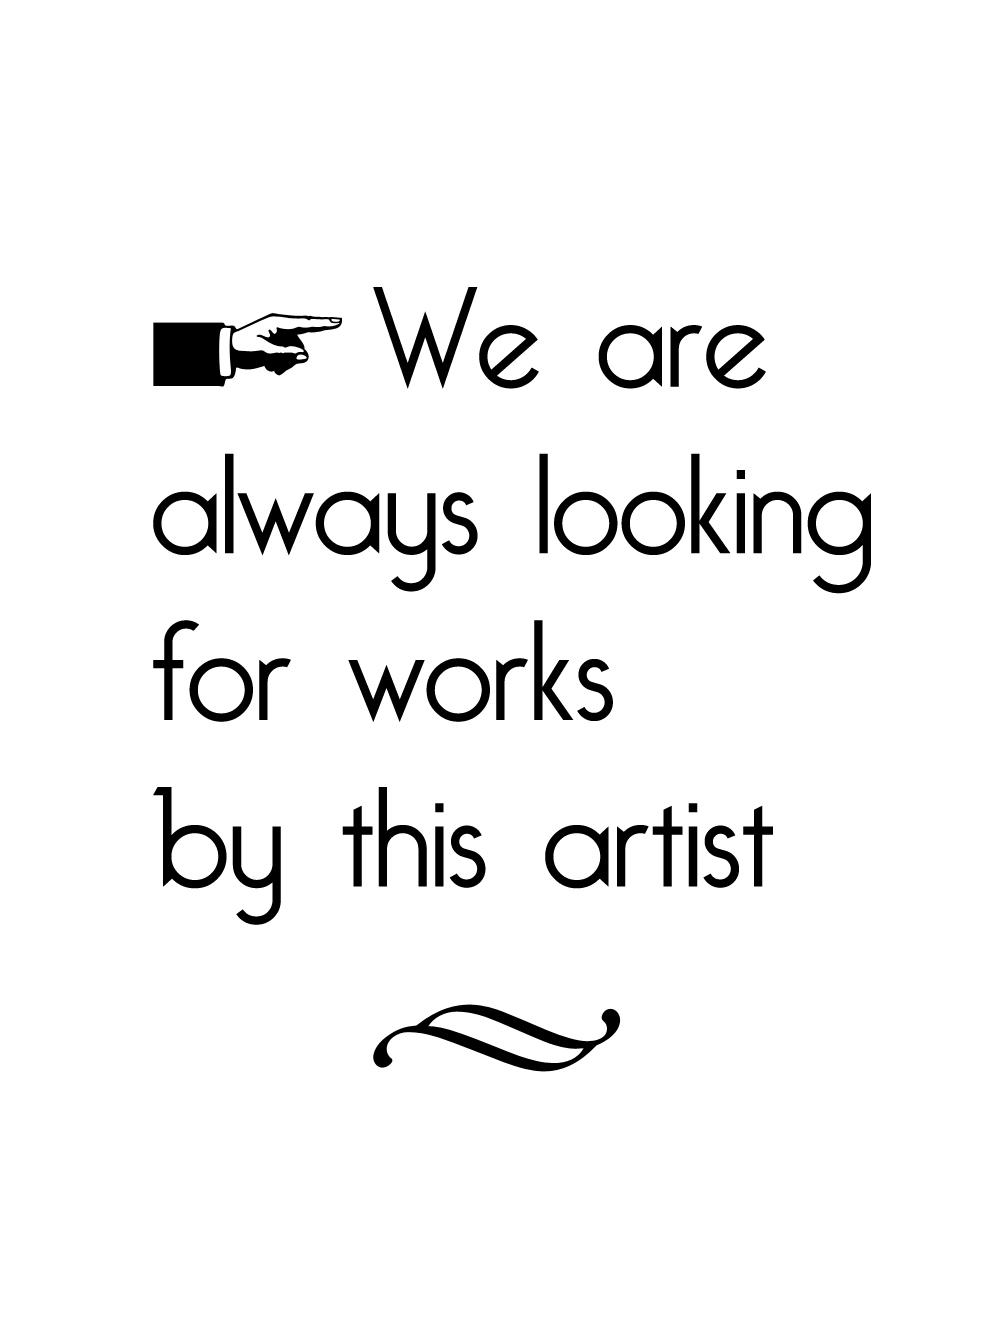 Seeking-Works-image